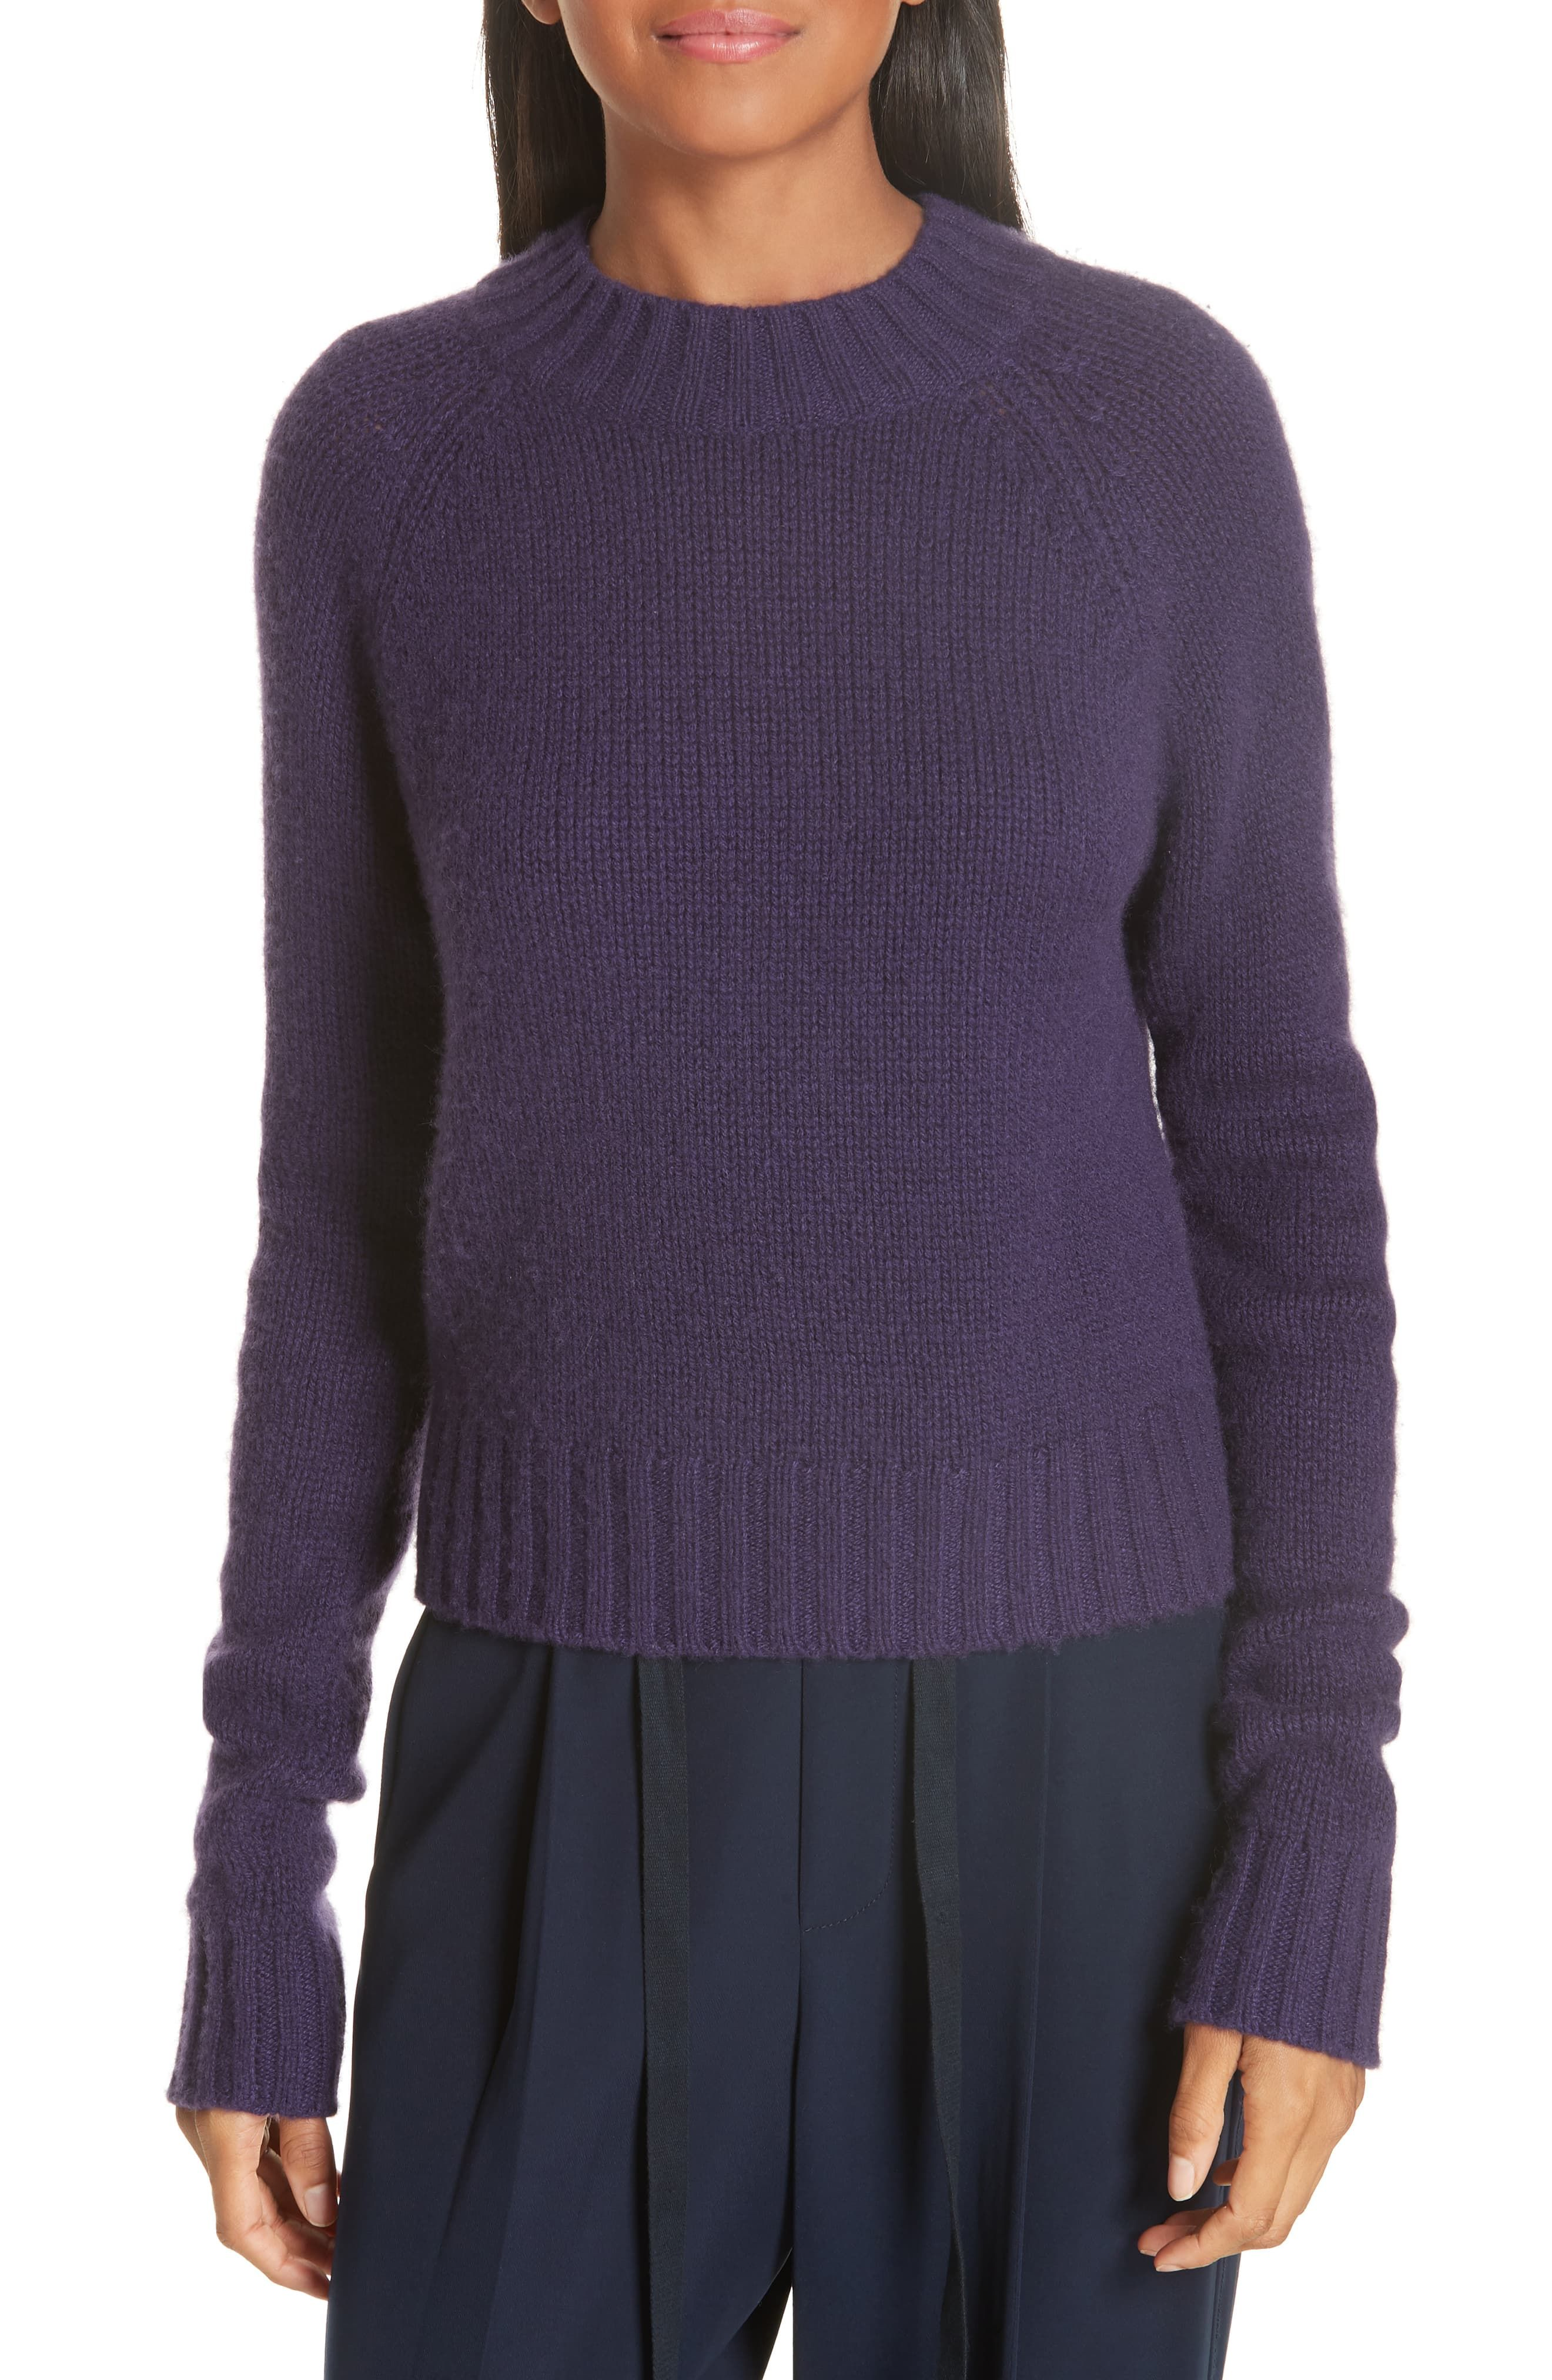 Cashmere blend wool rib knit long cardigan XS beige tops Lady's